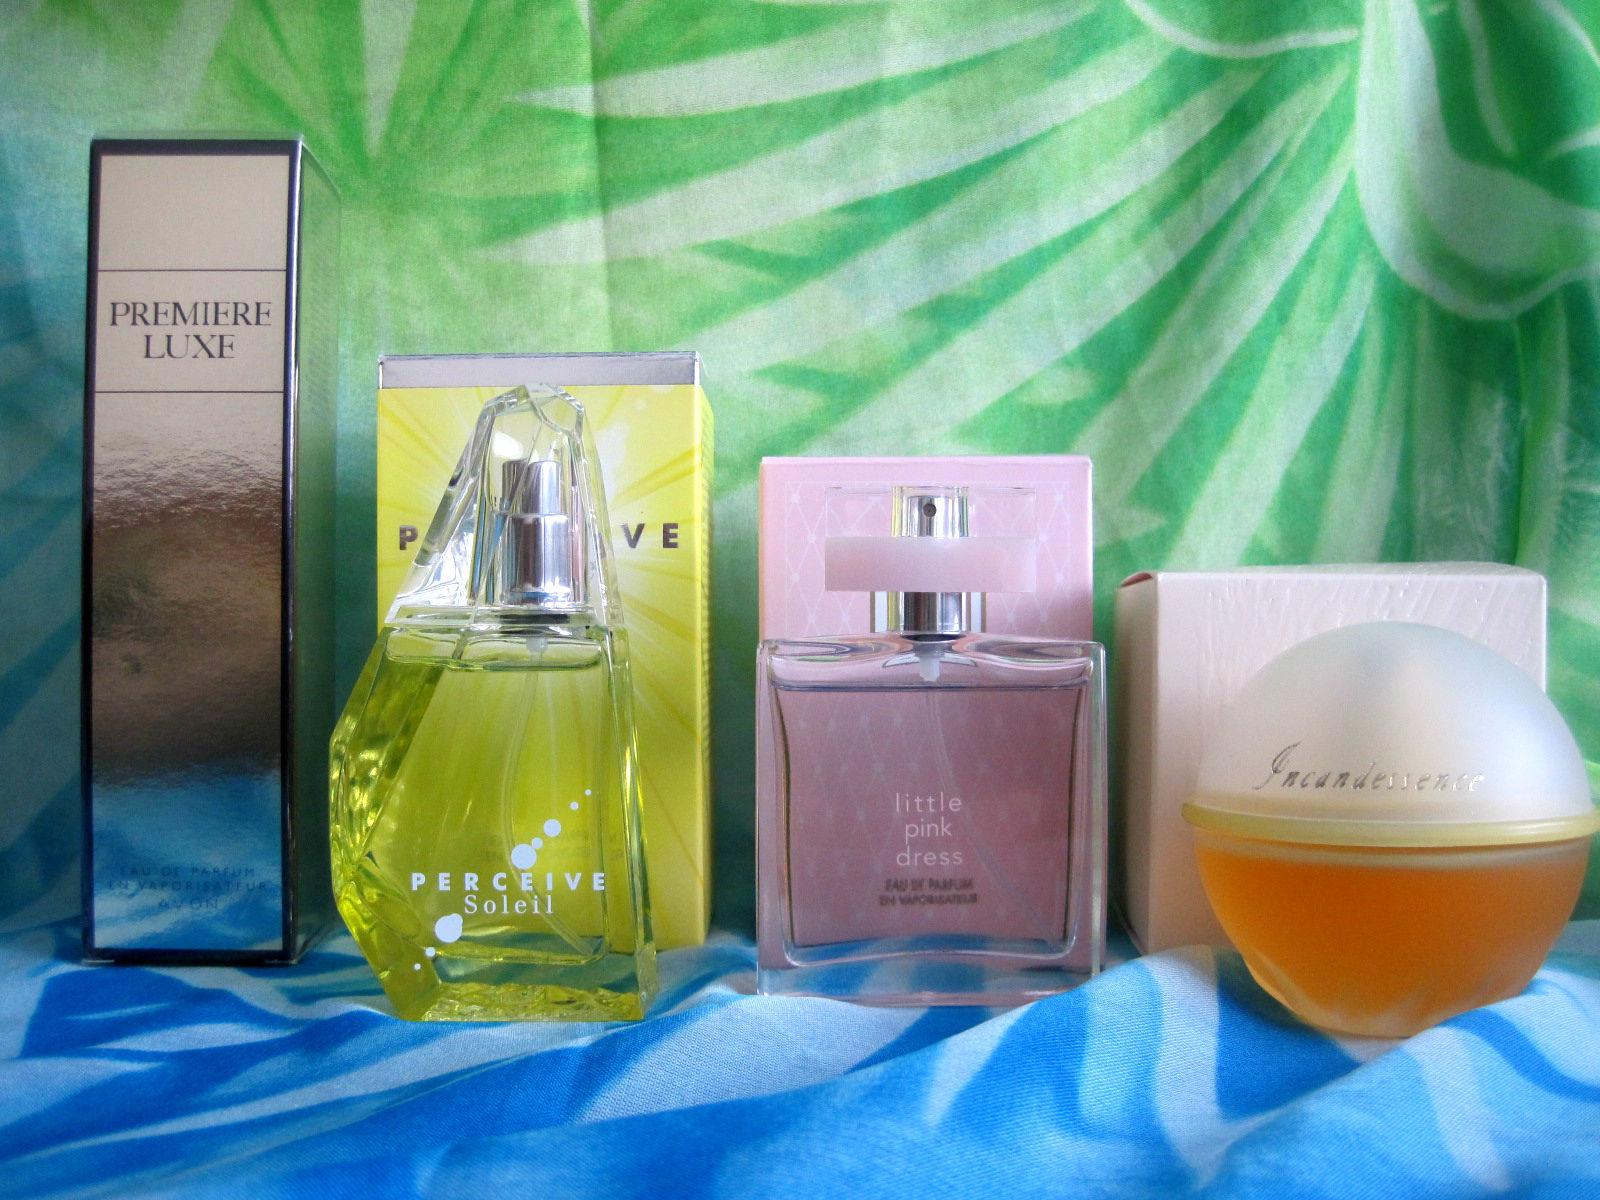 perfumy Avon, mixoflife, Premiere Luxe, Perceive Soleil, Little Pink Dress, Incandessense